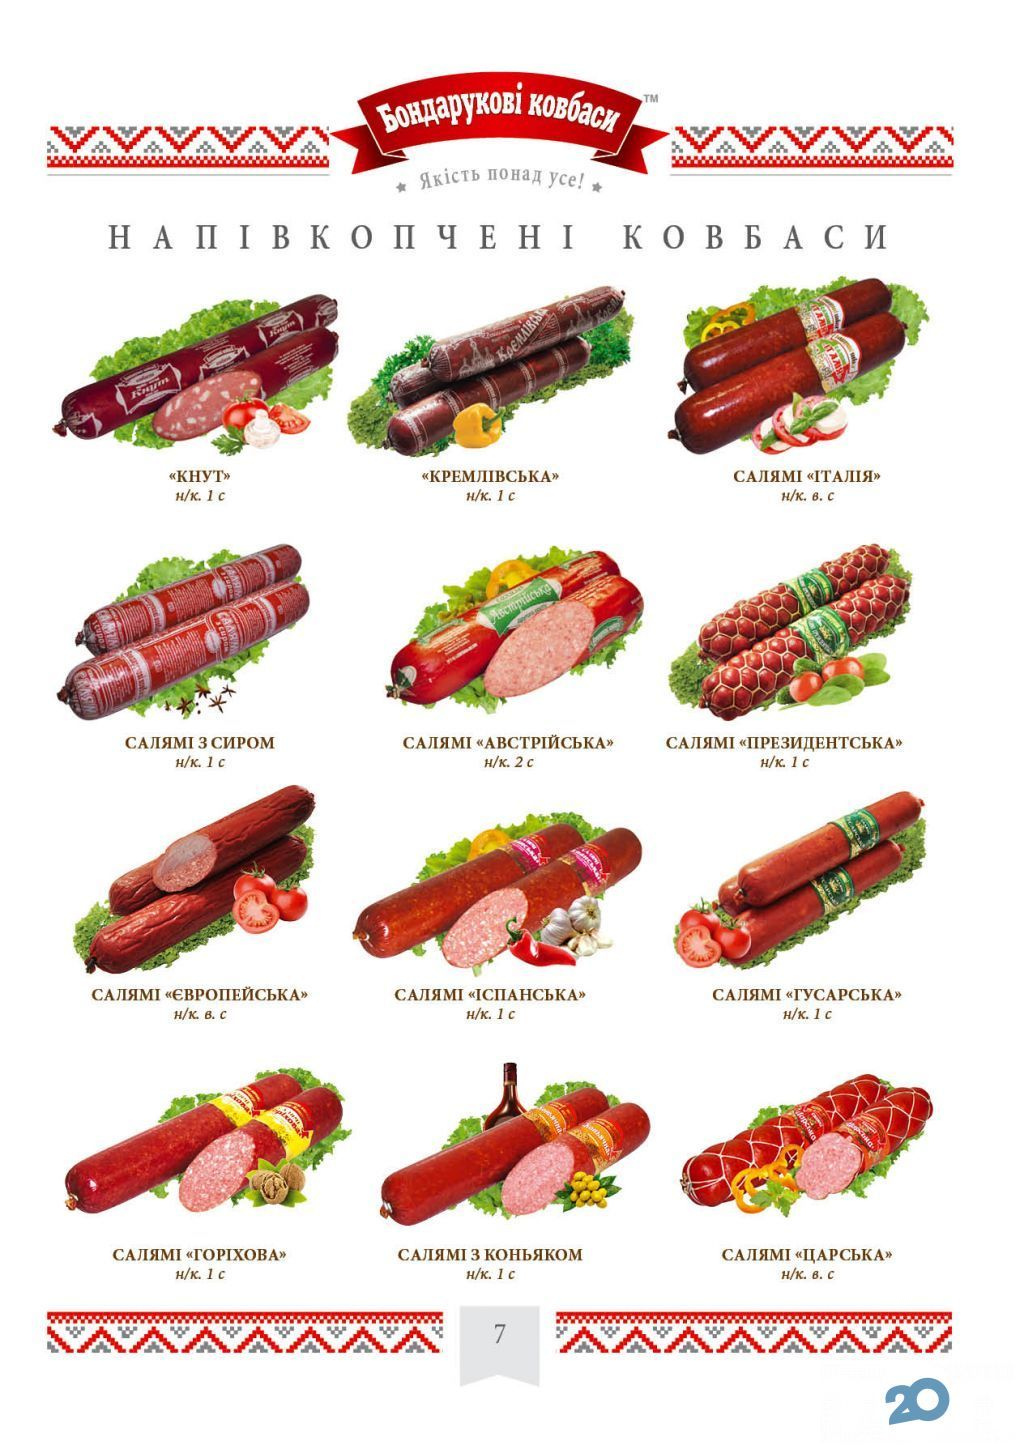 Бондарукові ковбаси, м'ясний магазин - фото 5